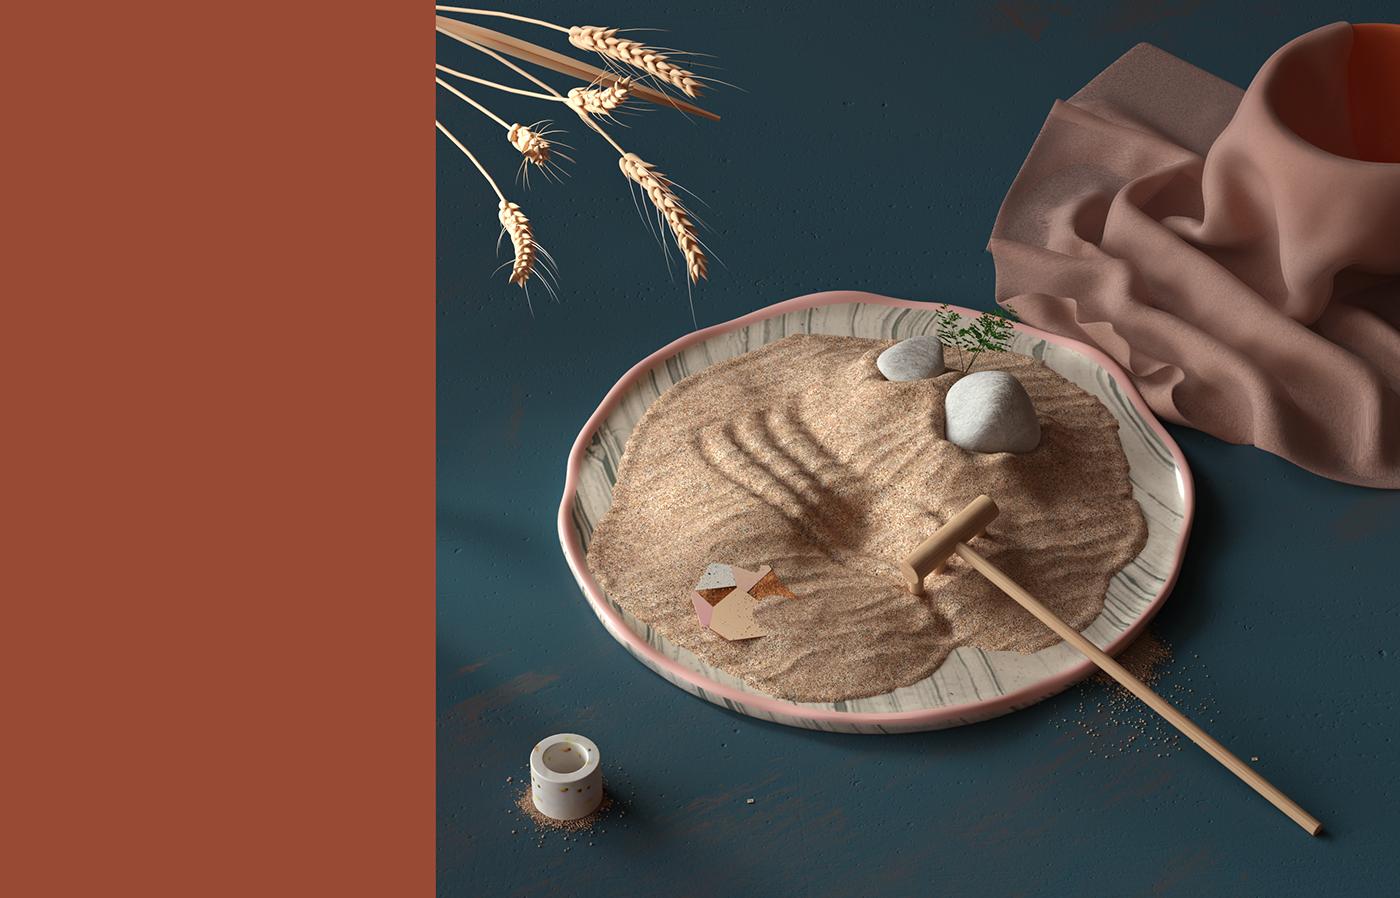 3D,3dart,ILLUSTRATION ,ArtDirection,colorpalette  ,WarmColors,sand,design,photoshop,SETCOMPOSITION